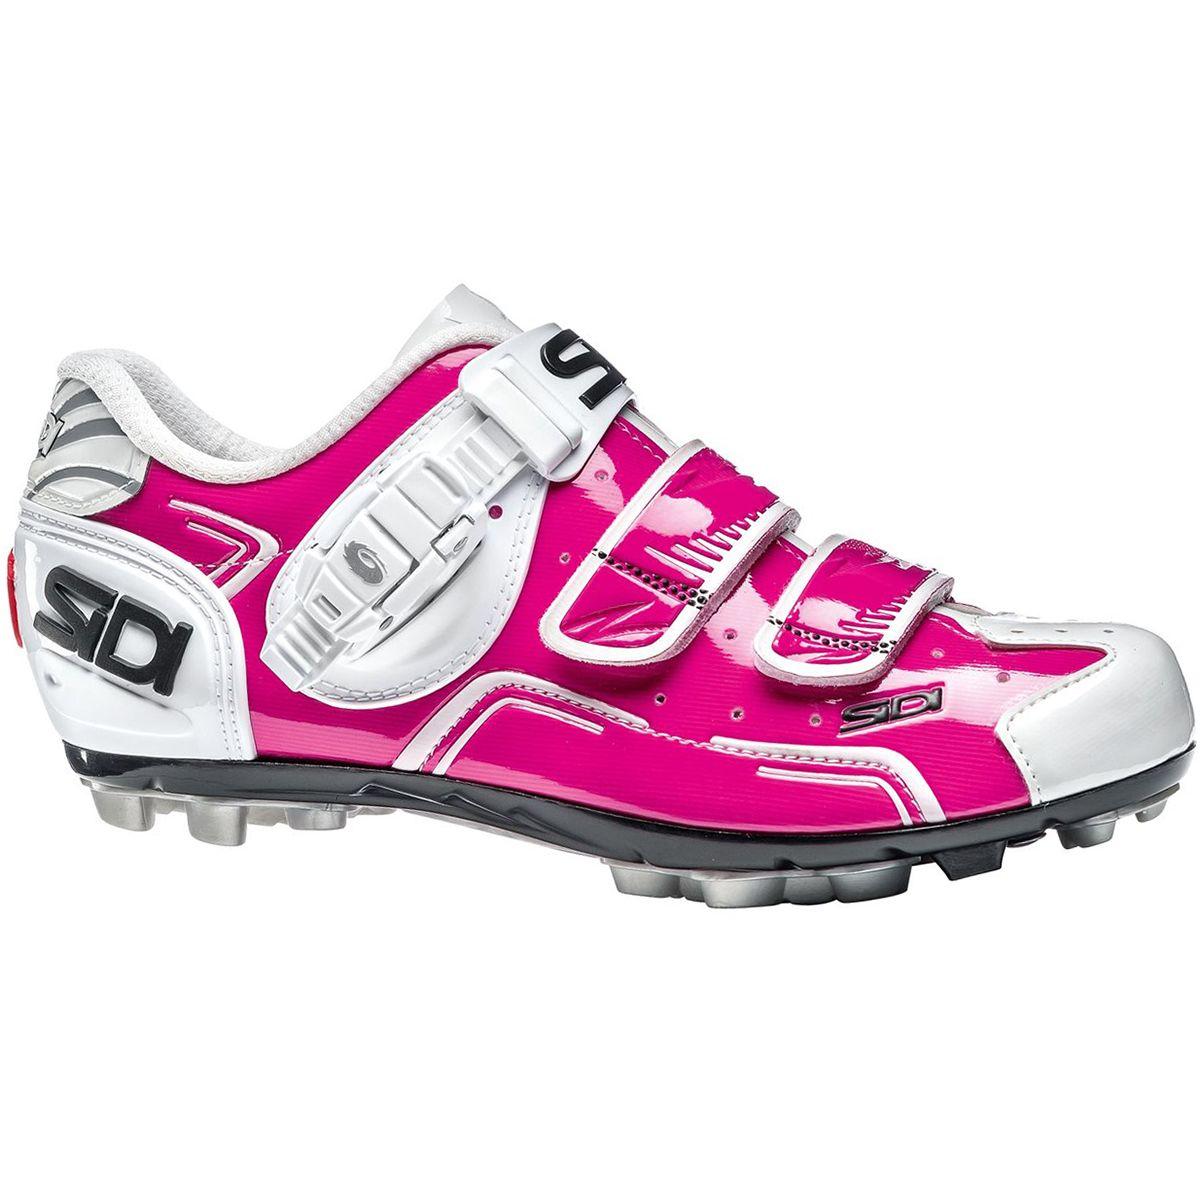 Sidi Mountain Bike Shoes Women